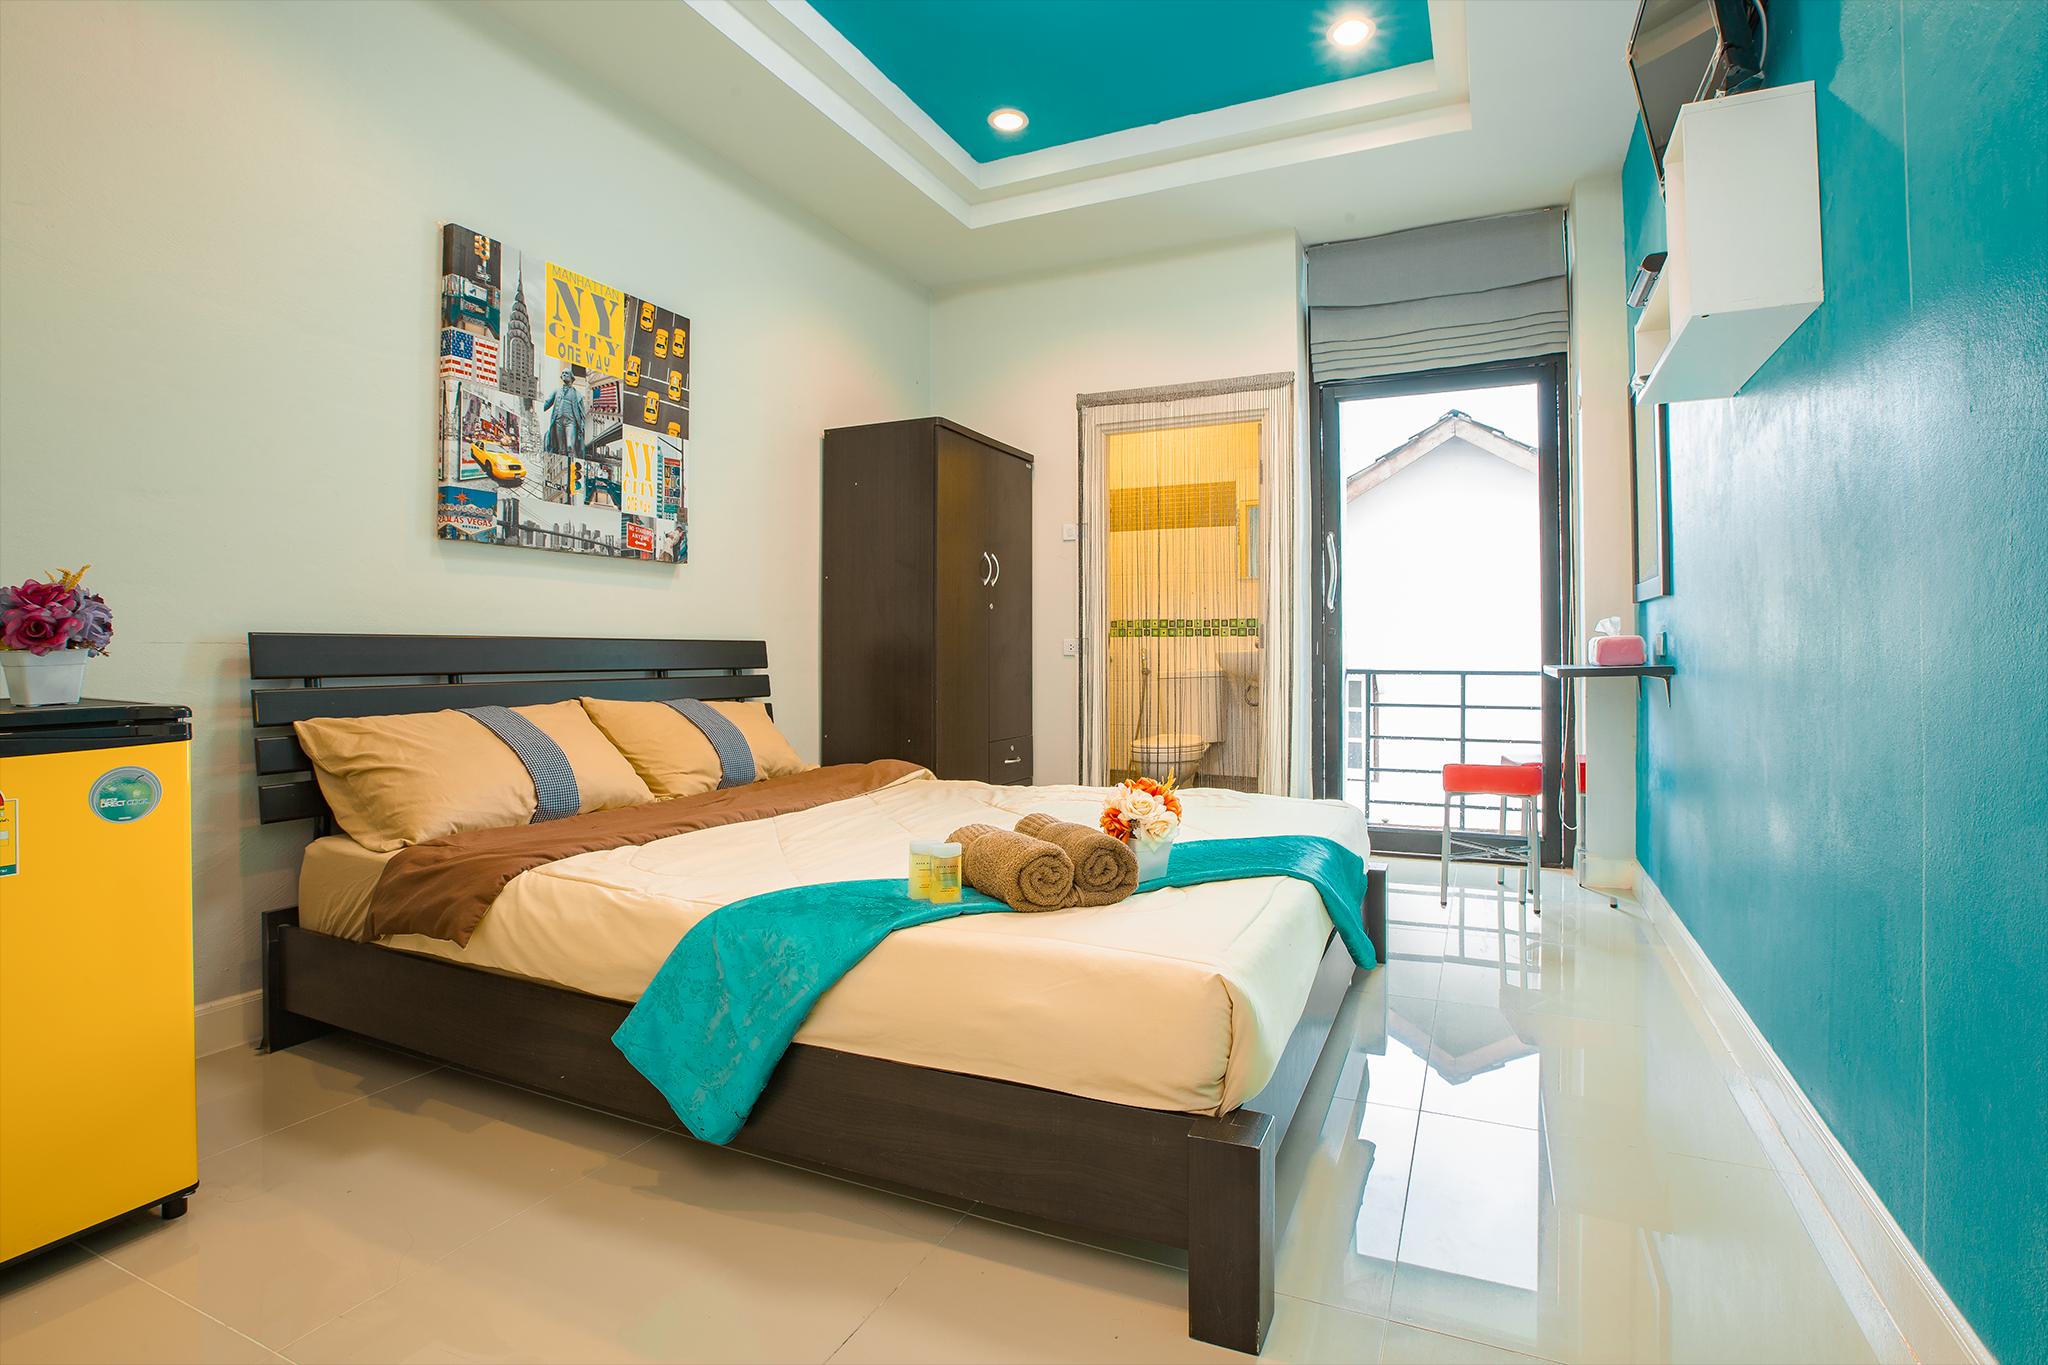 NTY House  Standard Room